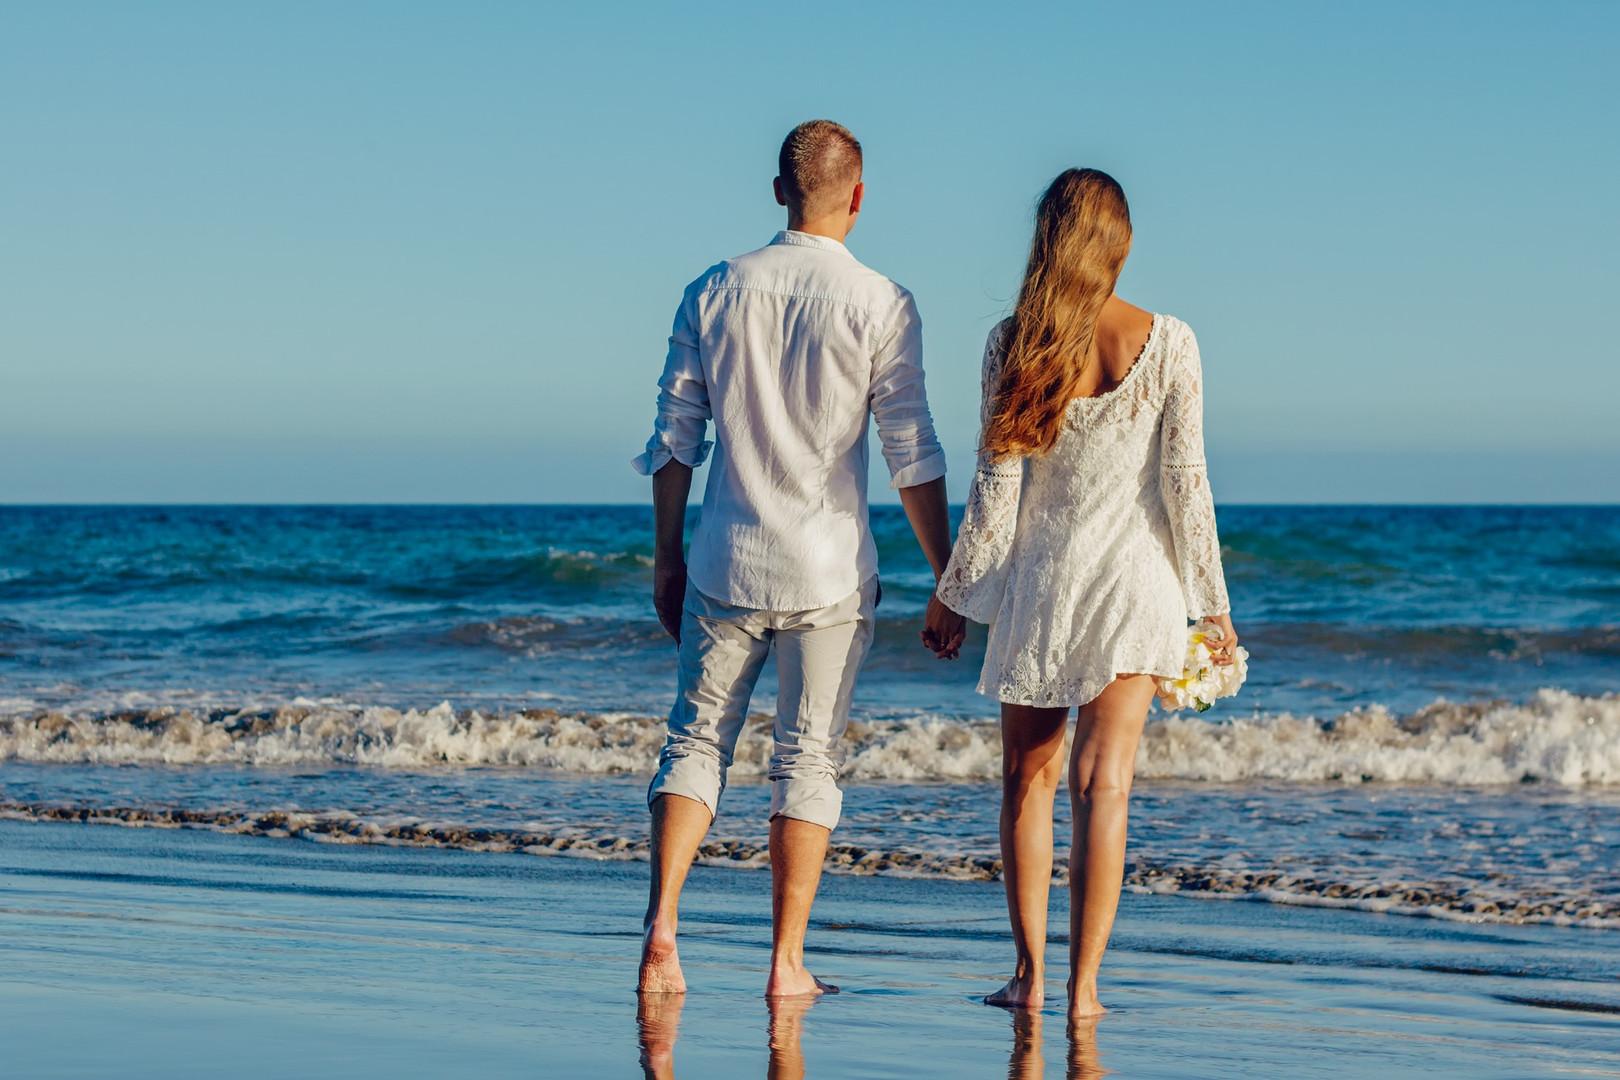 Wedding Couple Walking the Beach